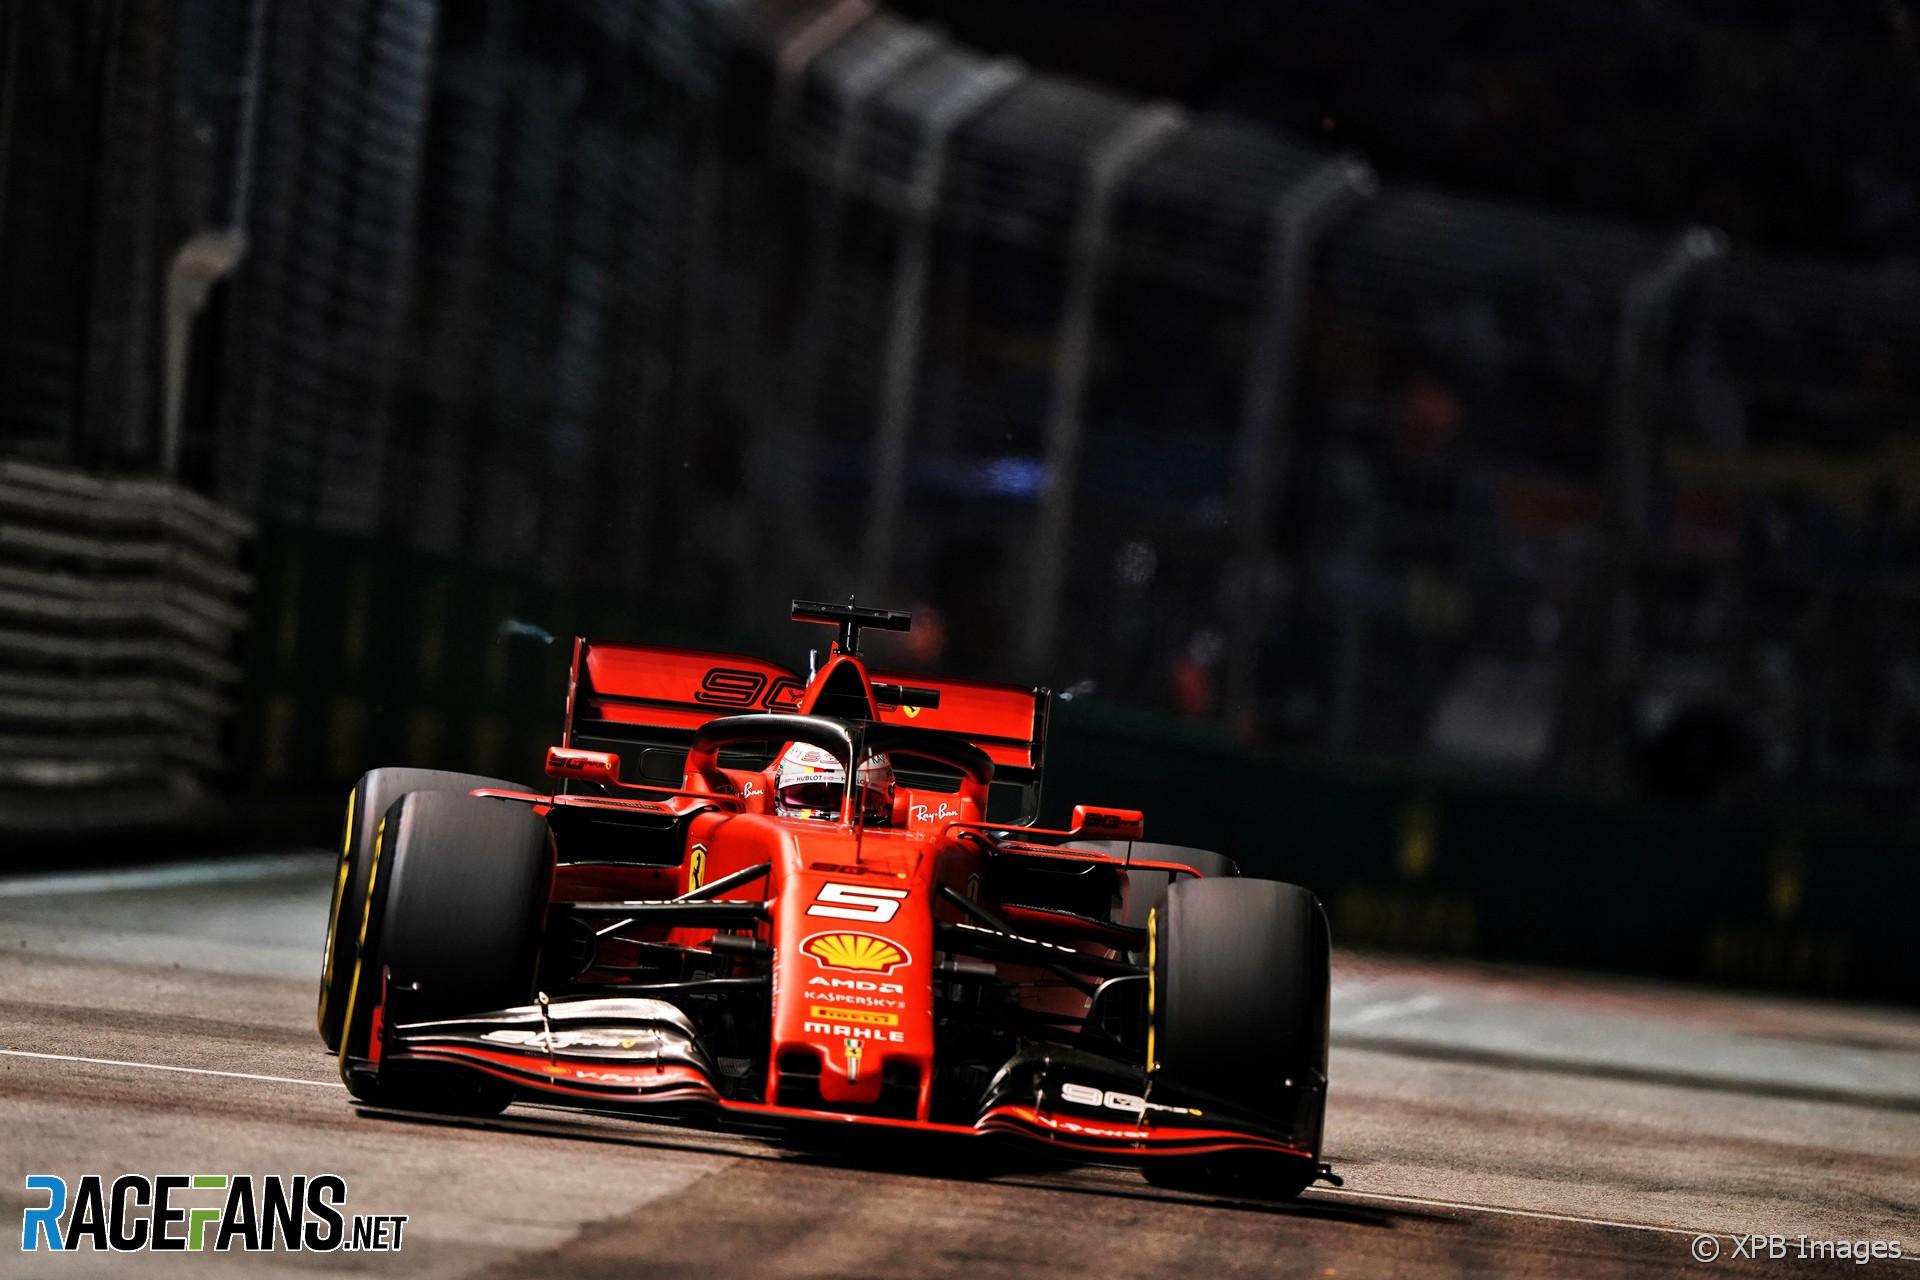 Sebastian Vettel, Ferrari, Singapore, 2019